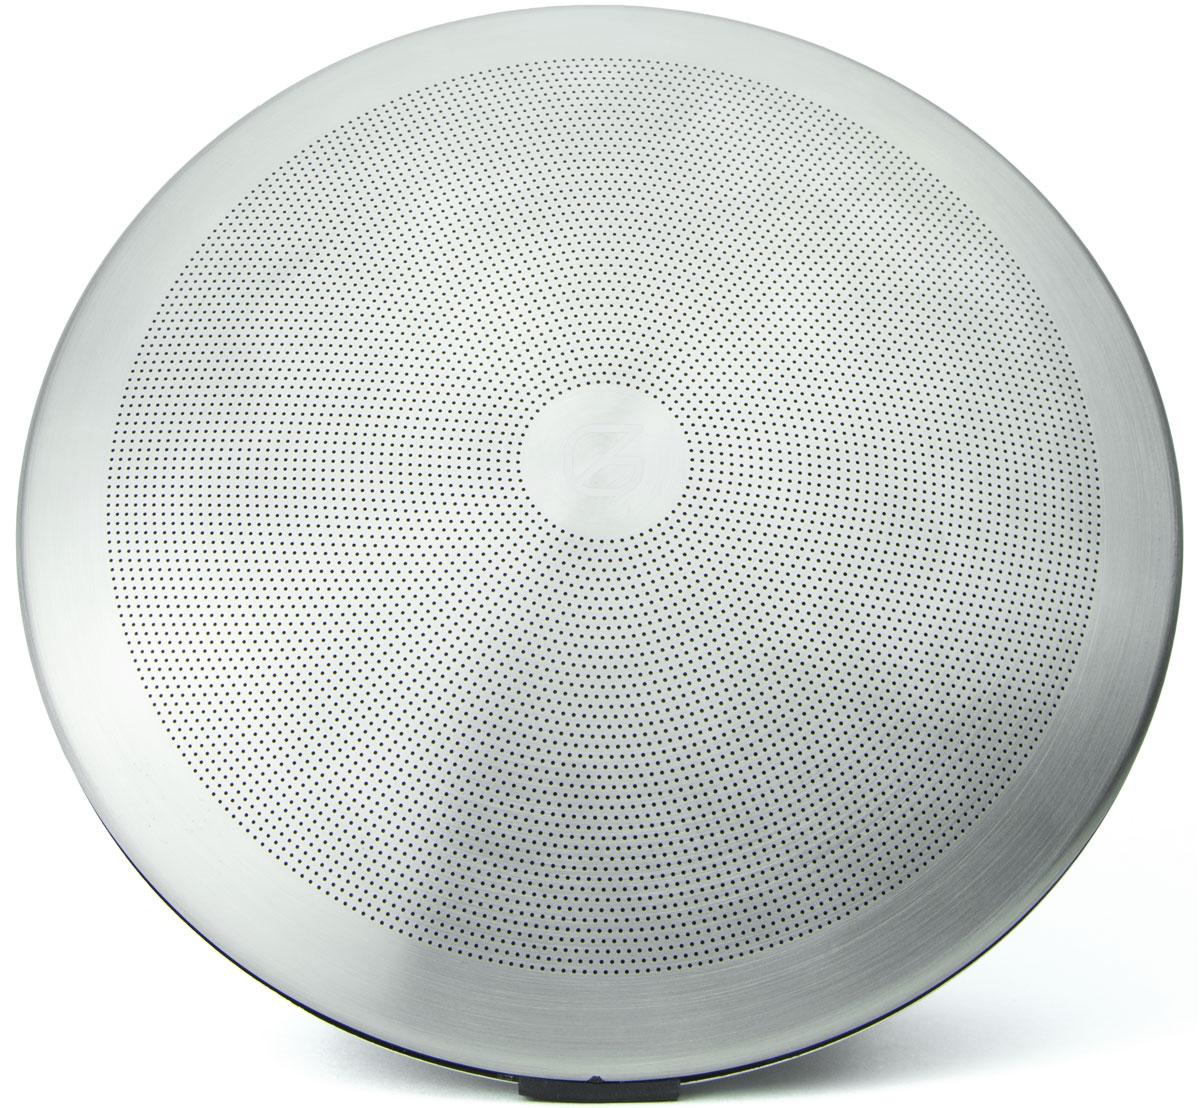 GZ Electronics LoftSound GZ-88, Black портативная акустическая система bluetooth speaker loftsound gz 55 portable speakers